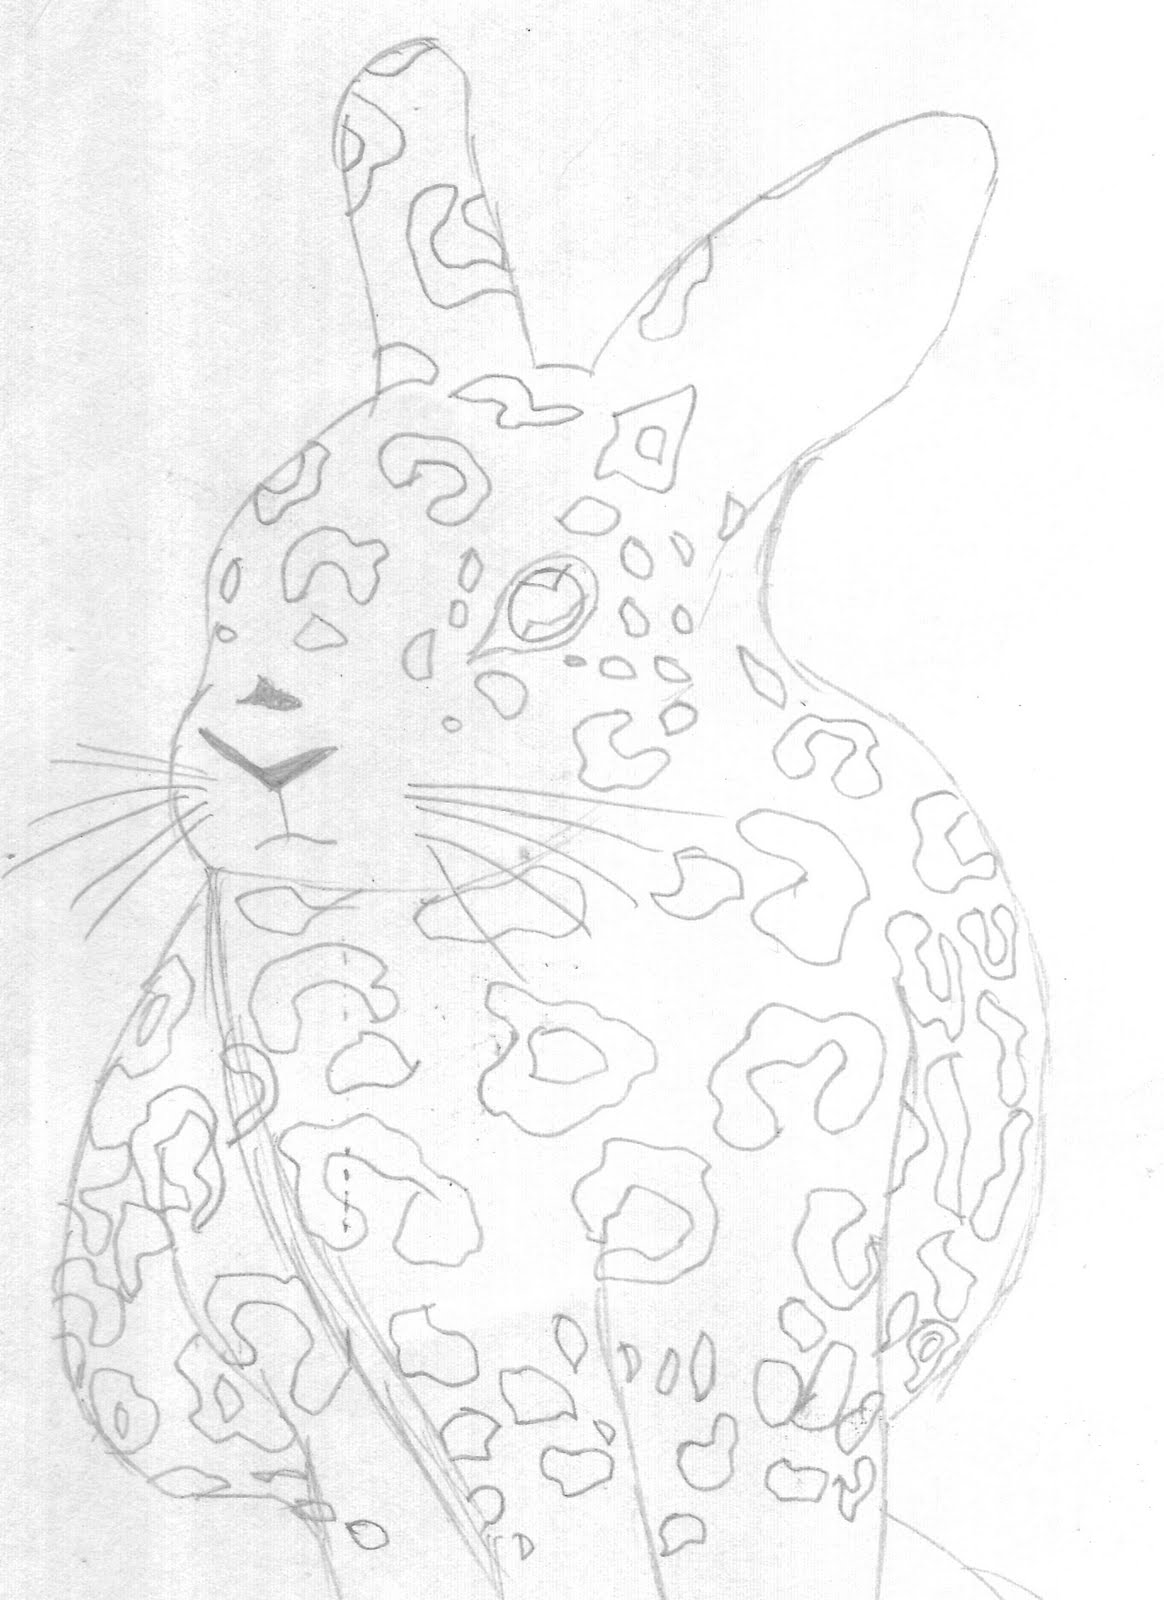 Tumblr Drawing Ideas Ecosia